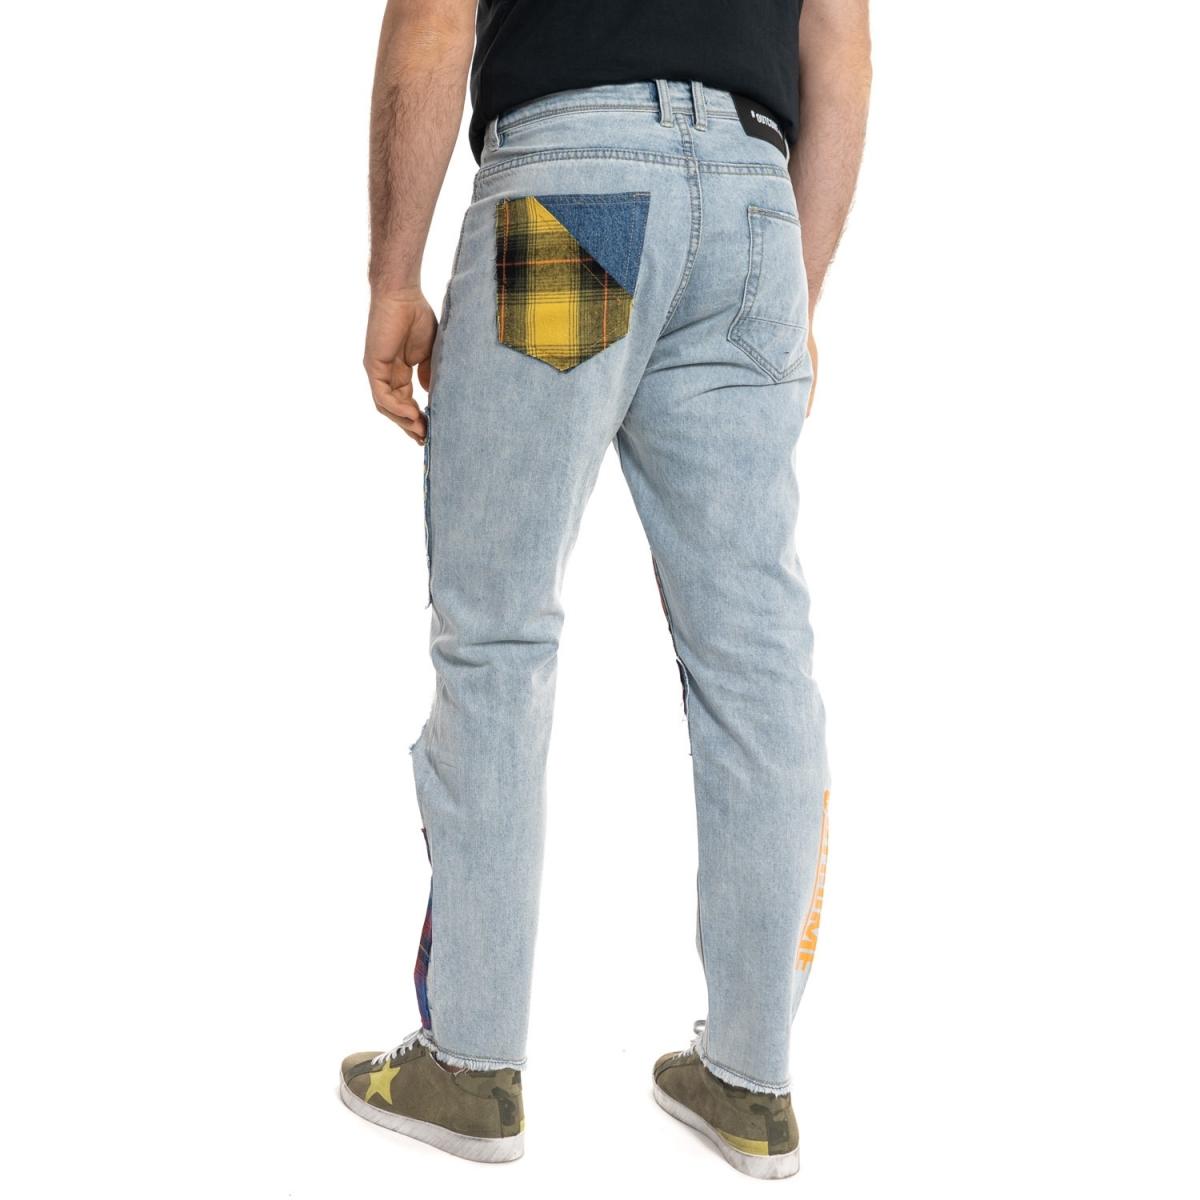 abbigliamento Jeans uomo Jeans con toppe GLOT688Y GIANNI LUPO Cafedelmar Shop